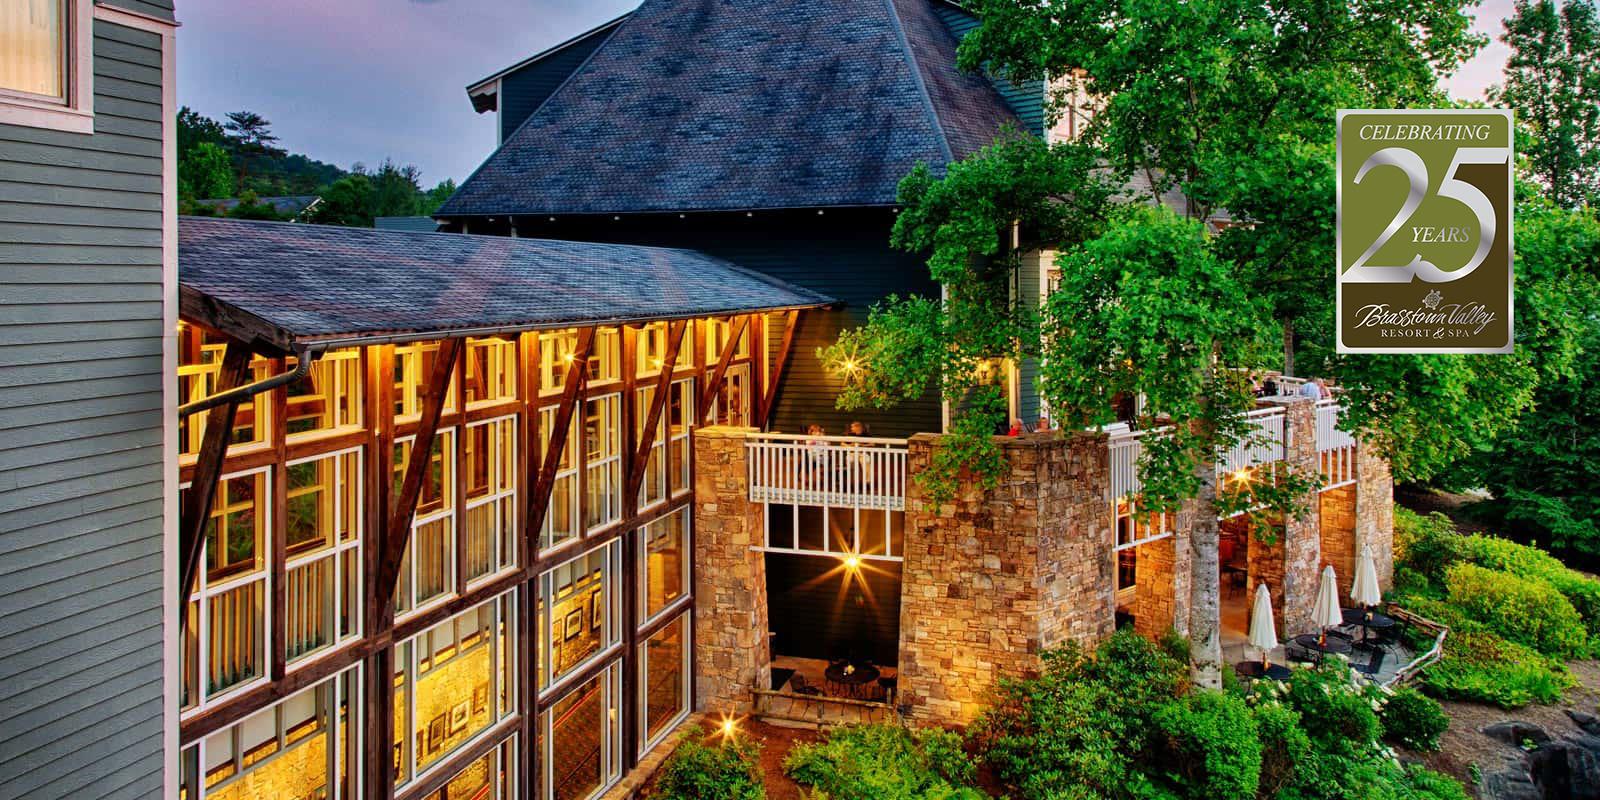 Brasstown Valley Hotel Image - Larger